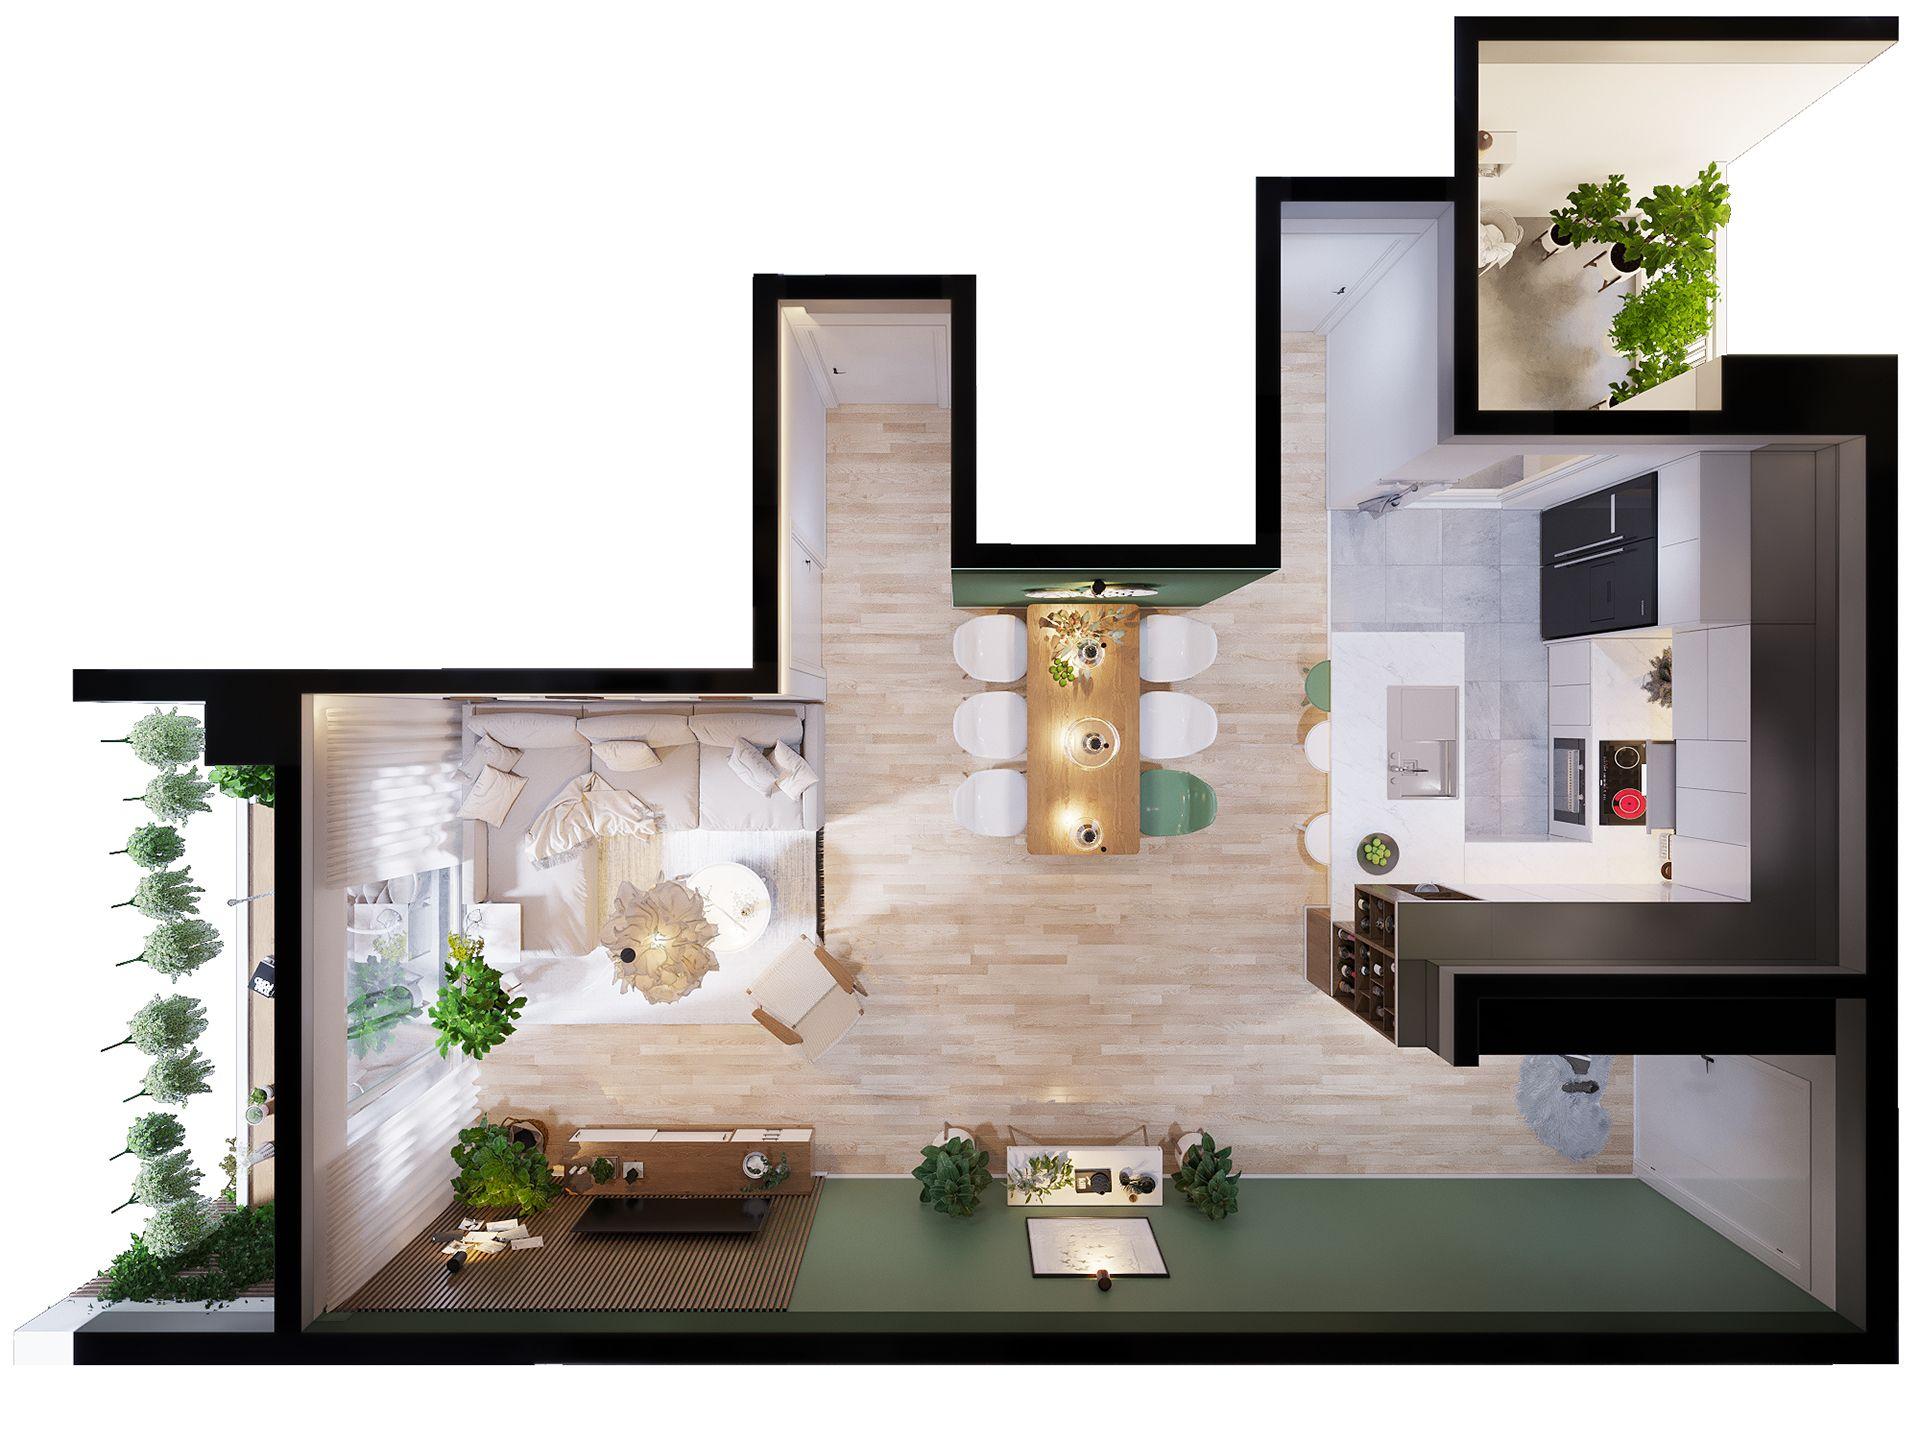 Modern Scandinavian Style Home Design For Young Families 2 Examples Scandinavian Style Home Unique House Design House Design